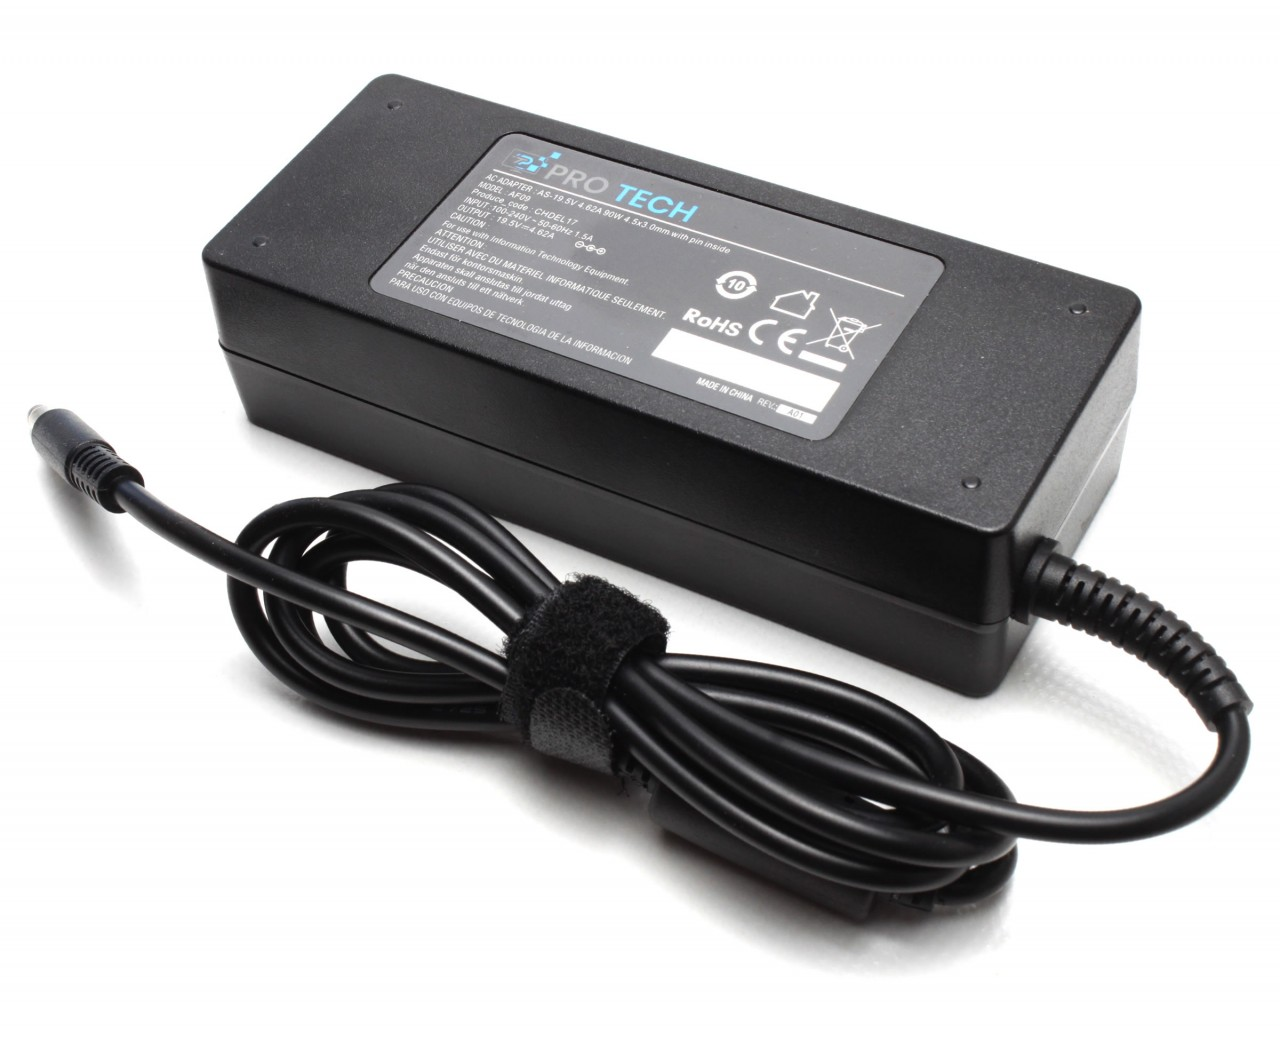 Incarcator Dell Inspiron 15 5552 90W Replacement imagine powerlaptop.ro 2021